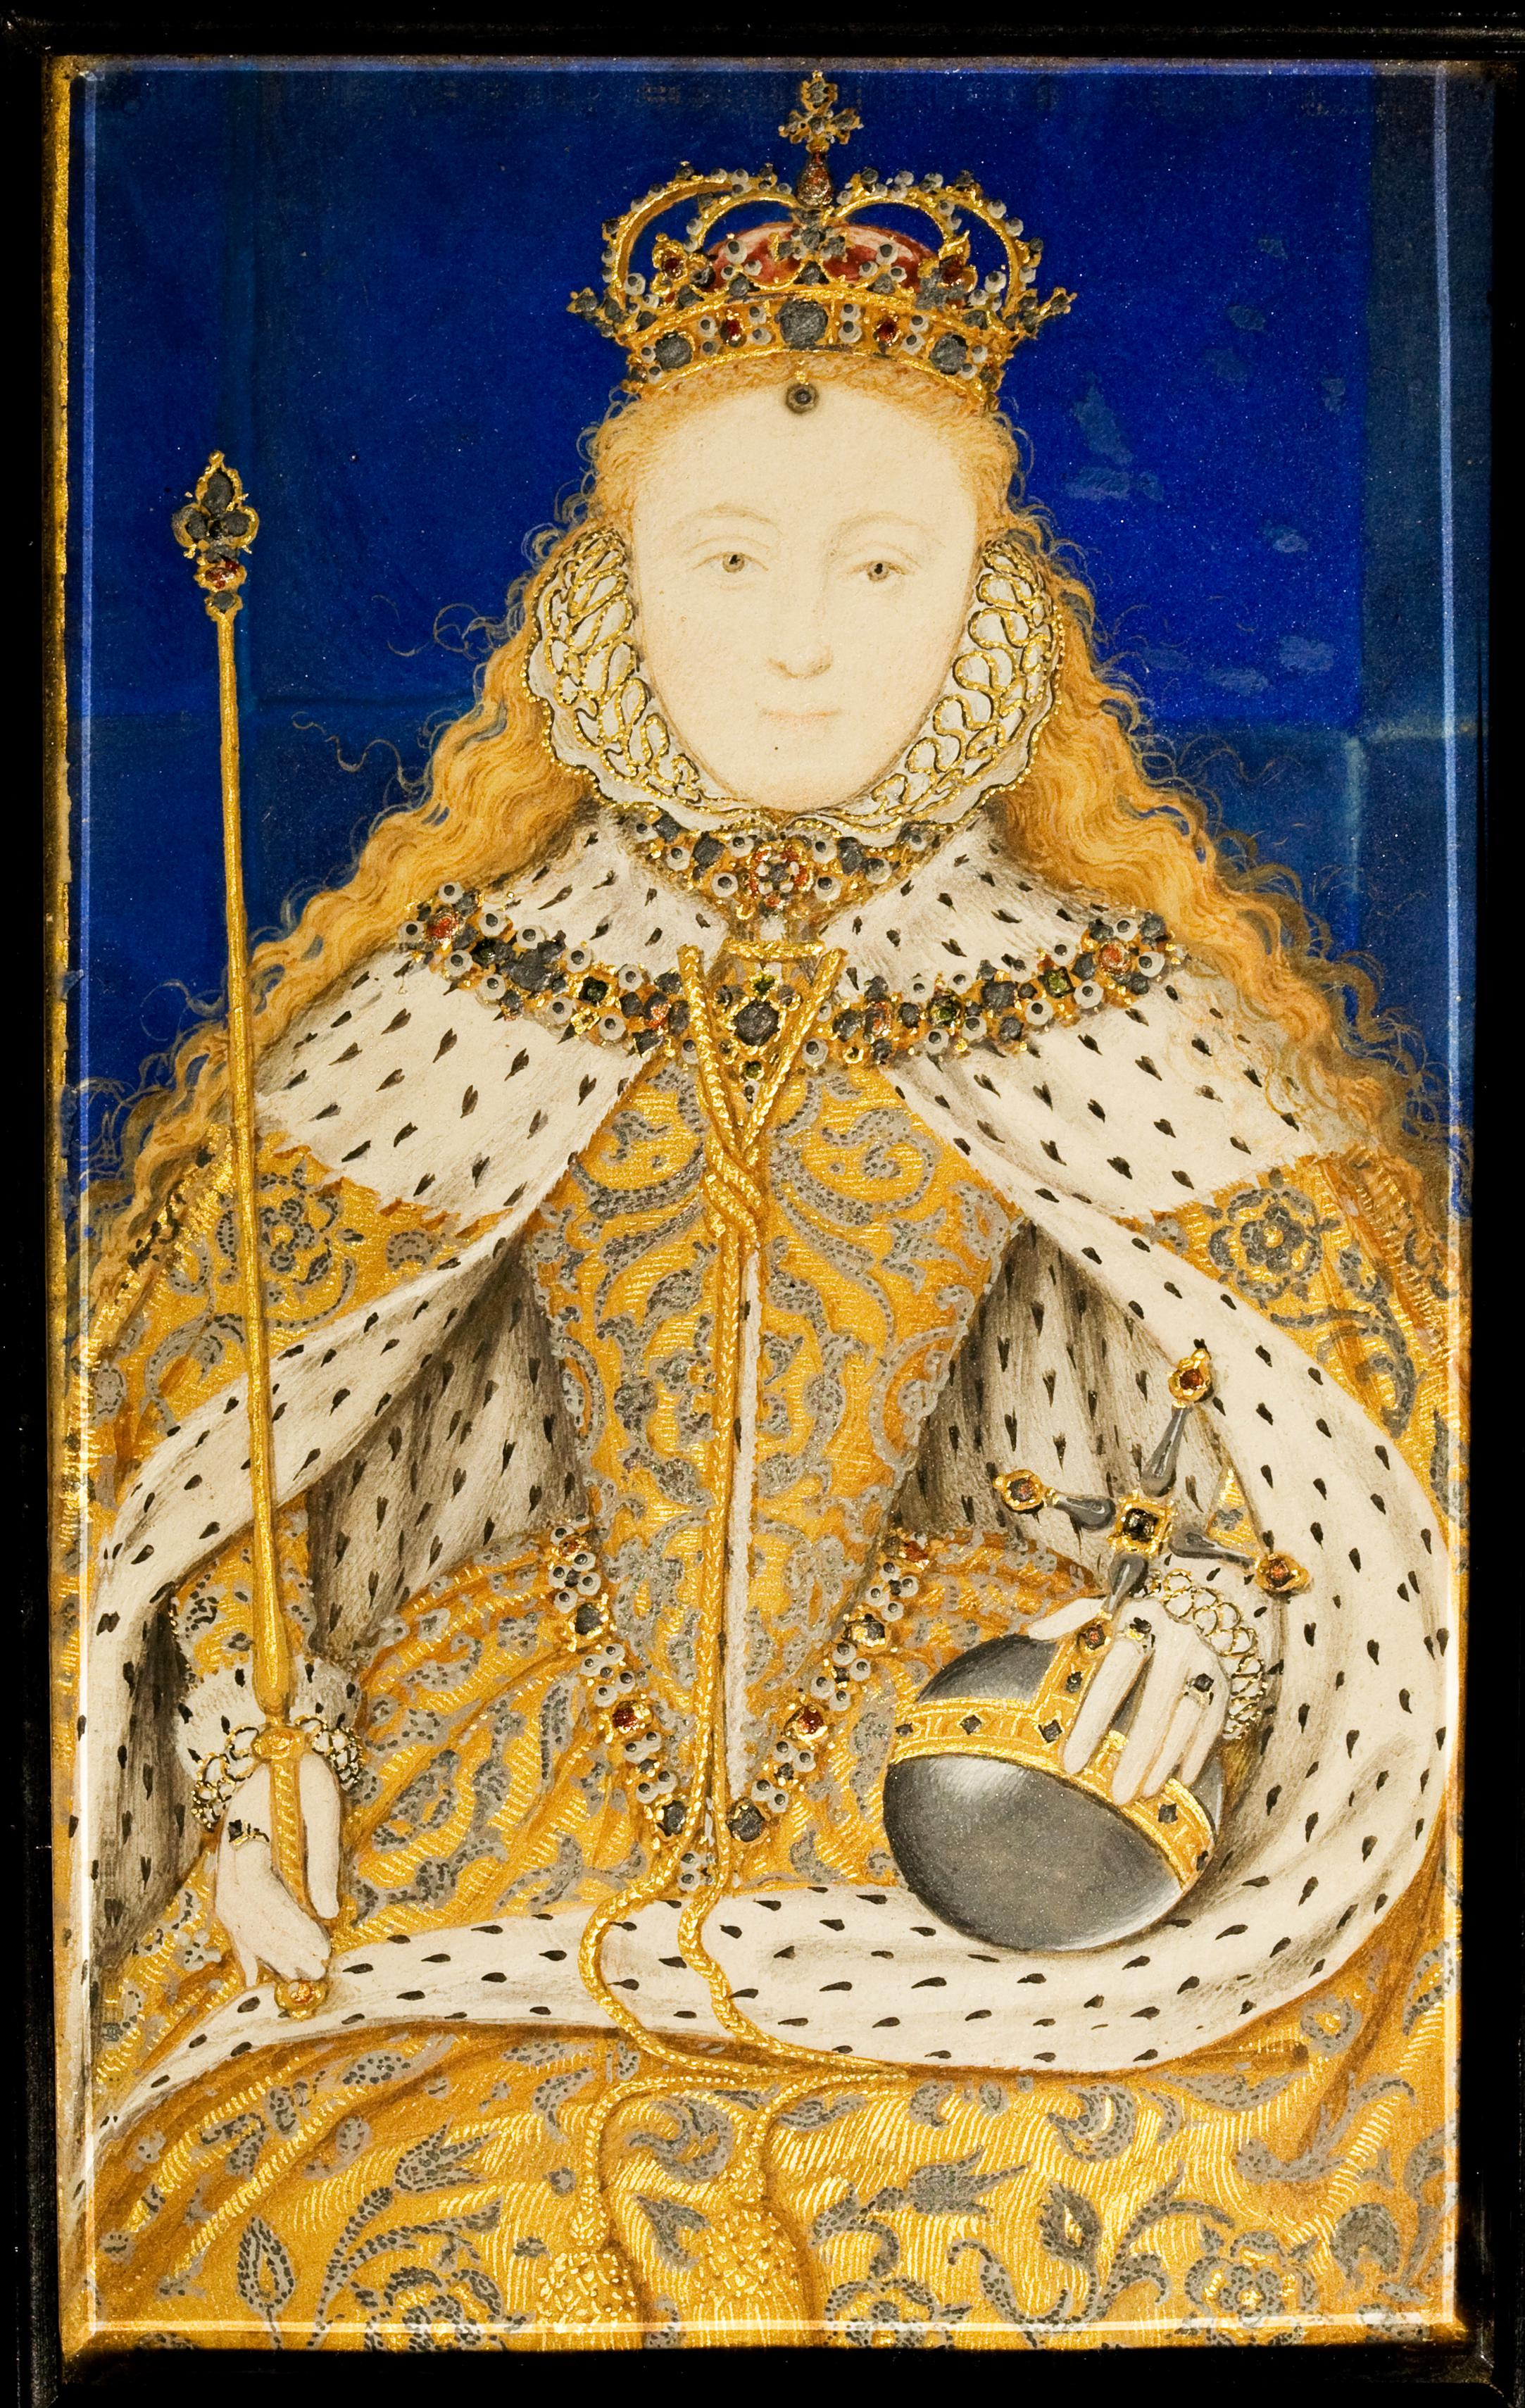 Queen Elizabeth I by Nicholas Hilliard